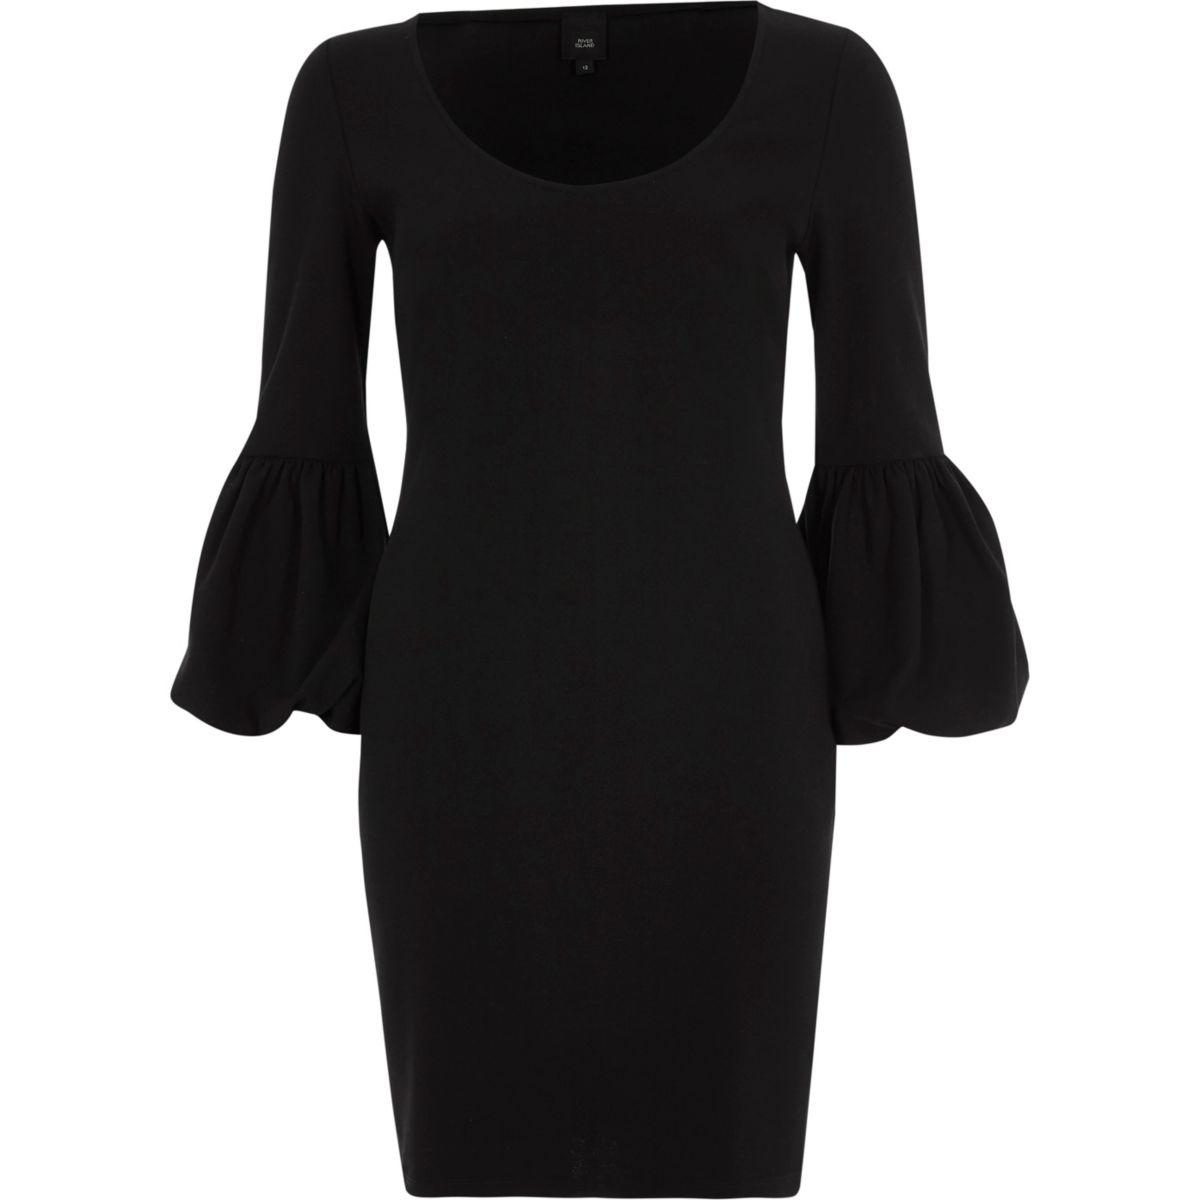 Black long balloon sleeve bodycon midi dress